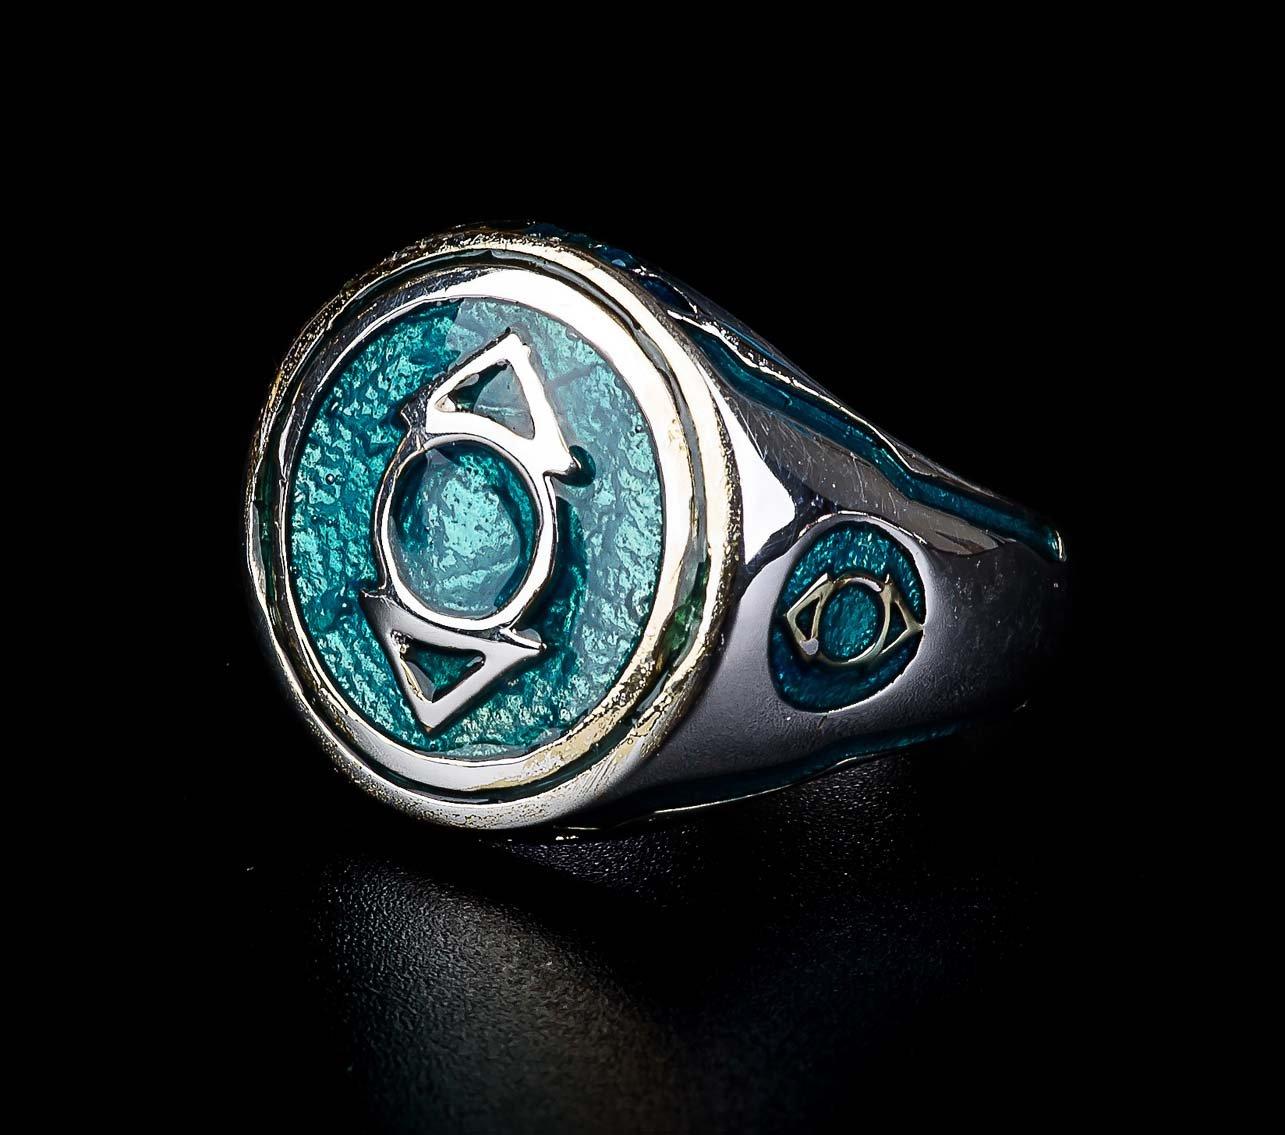 Indigo Tribe Lantern Ring Sinestro Corps Power Ring Purple Enamel 925 Sterling Silver Rings Kolenik Band